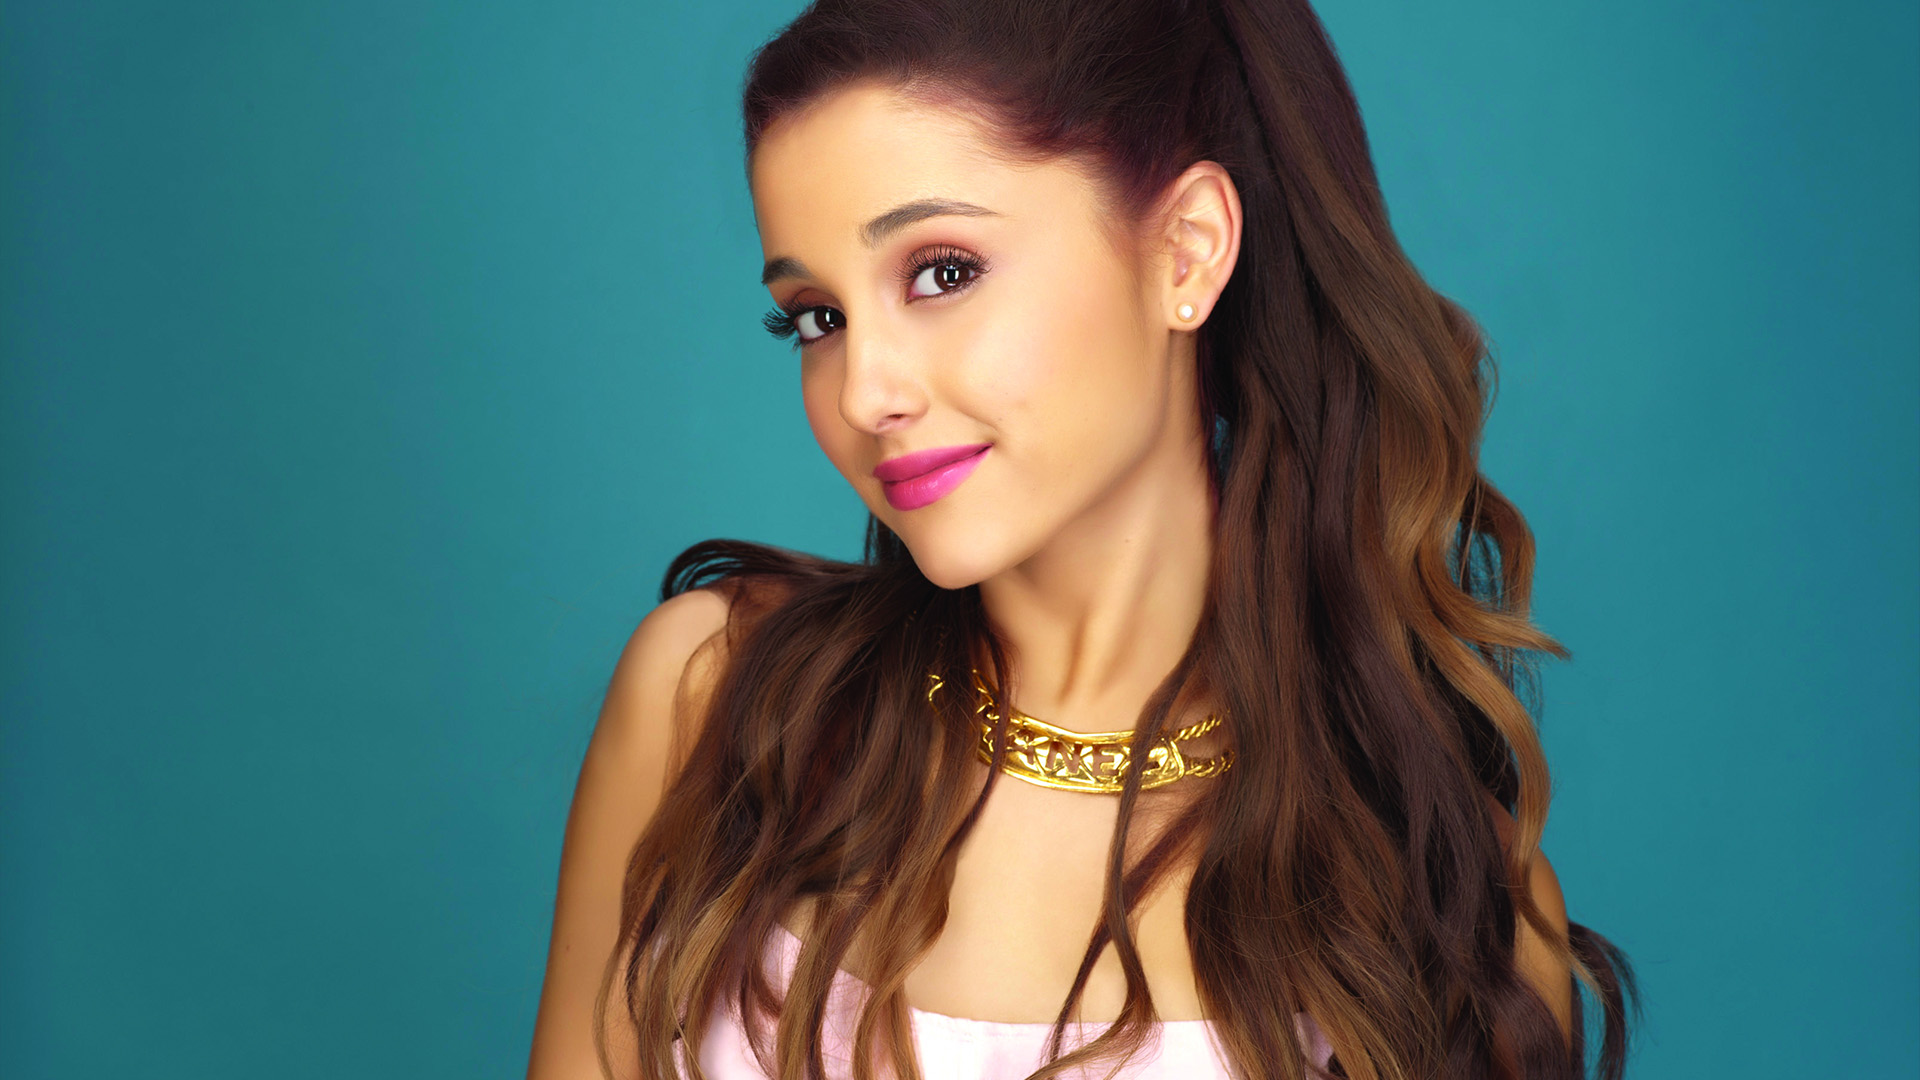 Happy 22nd birthday Ariana!